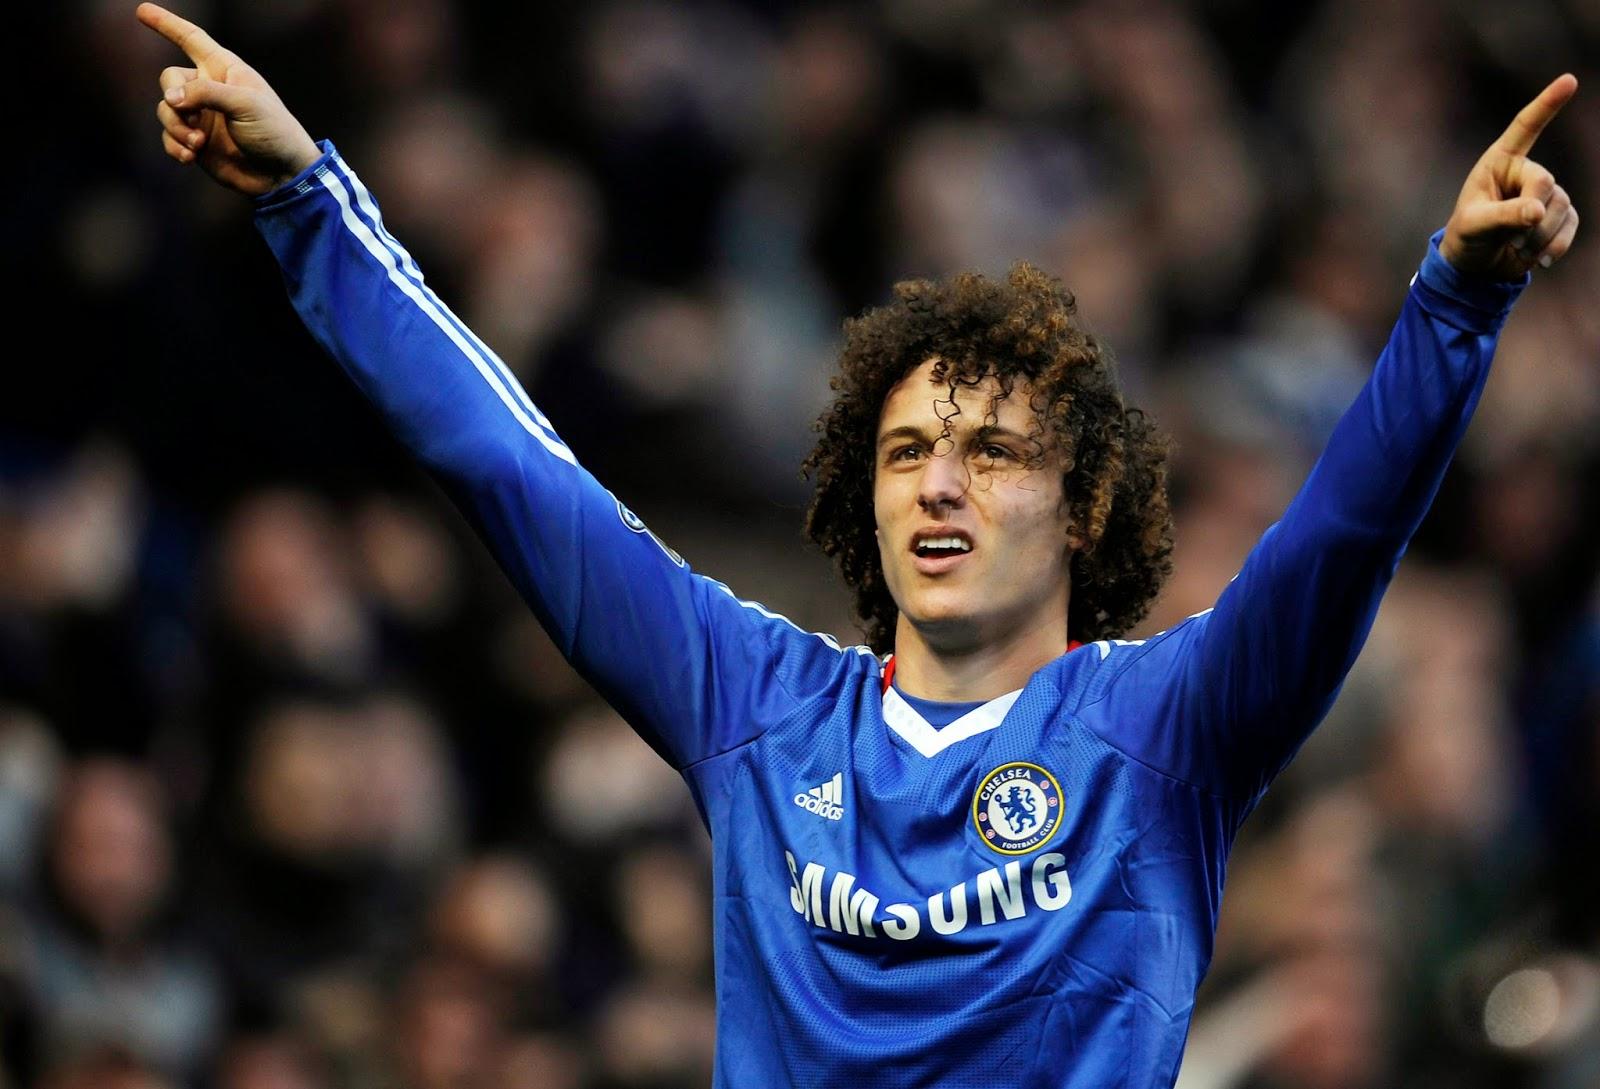 David Luiz Profile And New Hd Wallpapers 2014